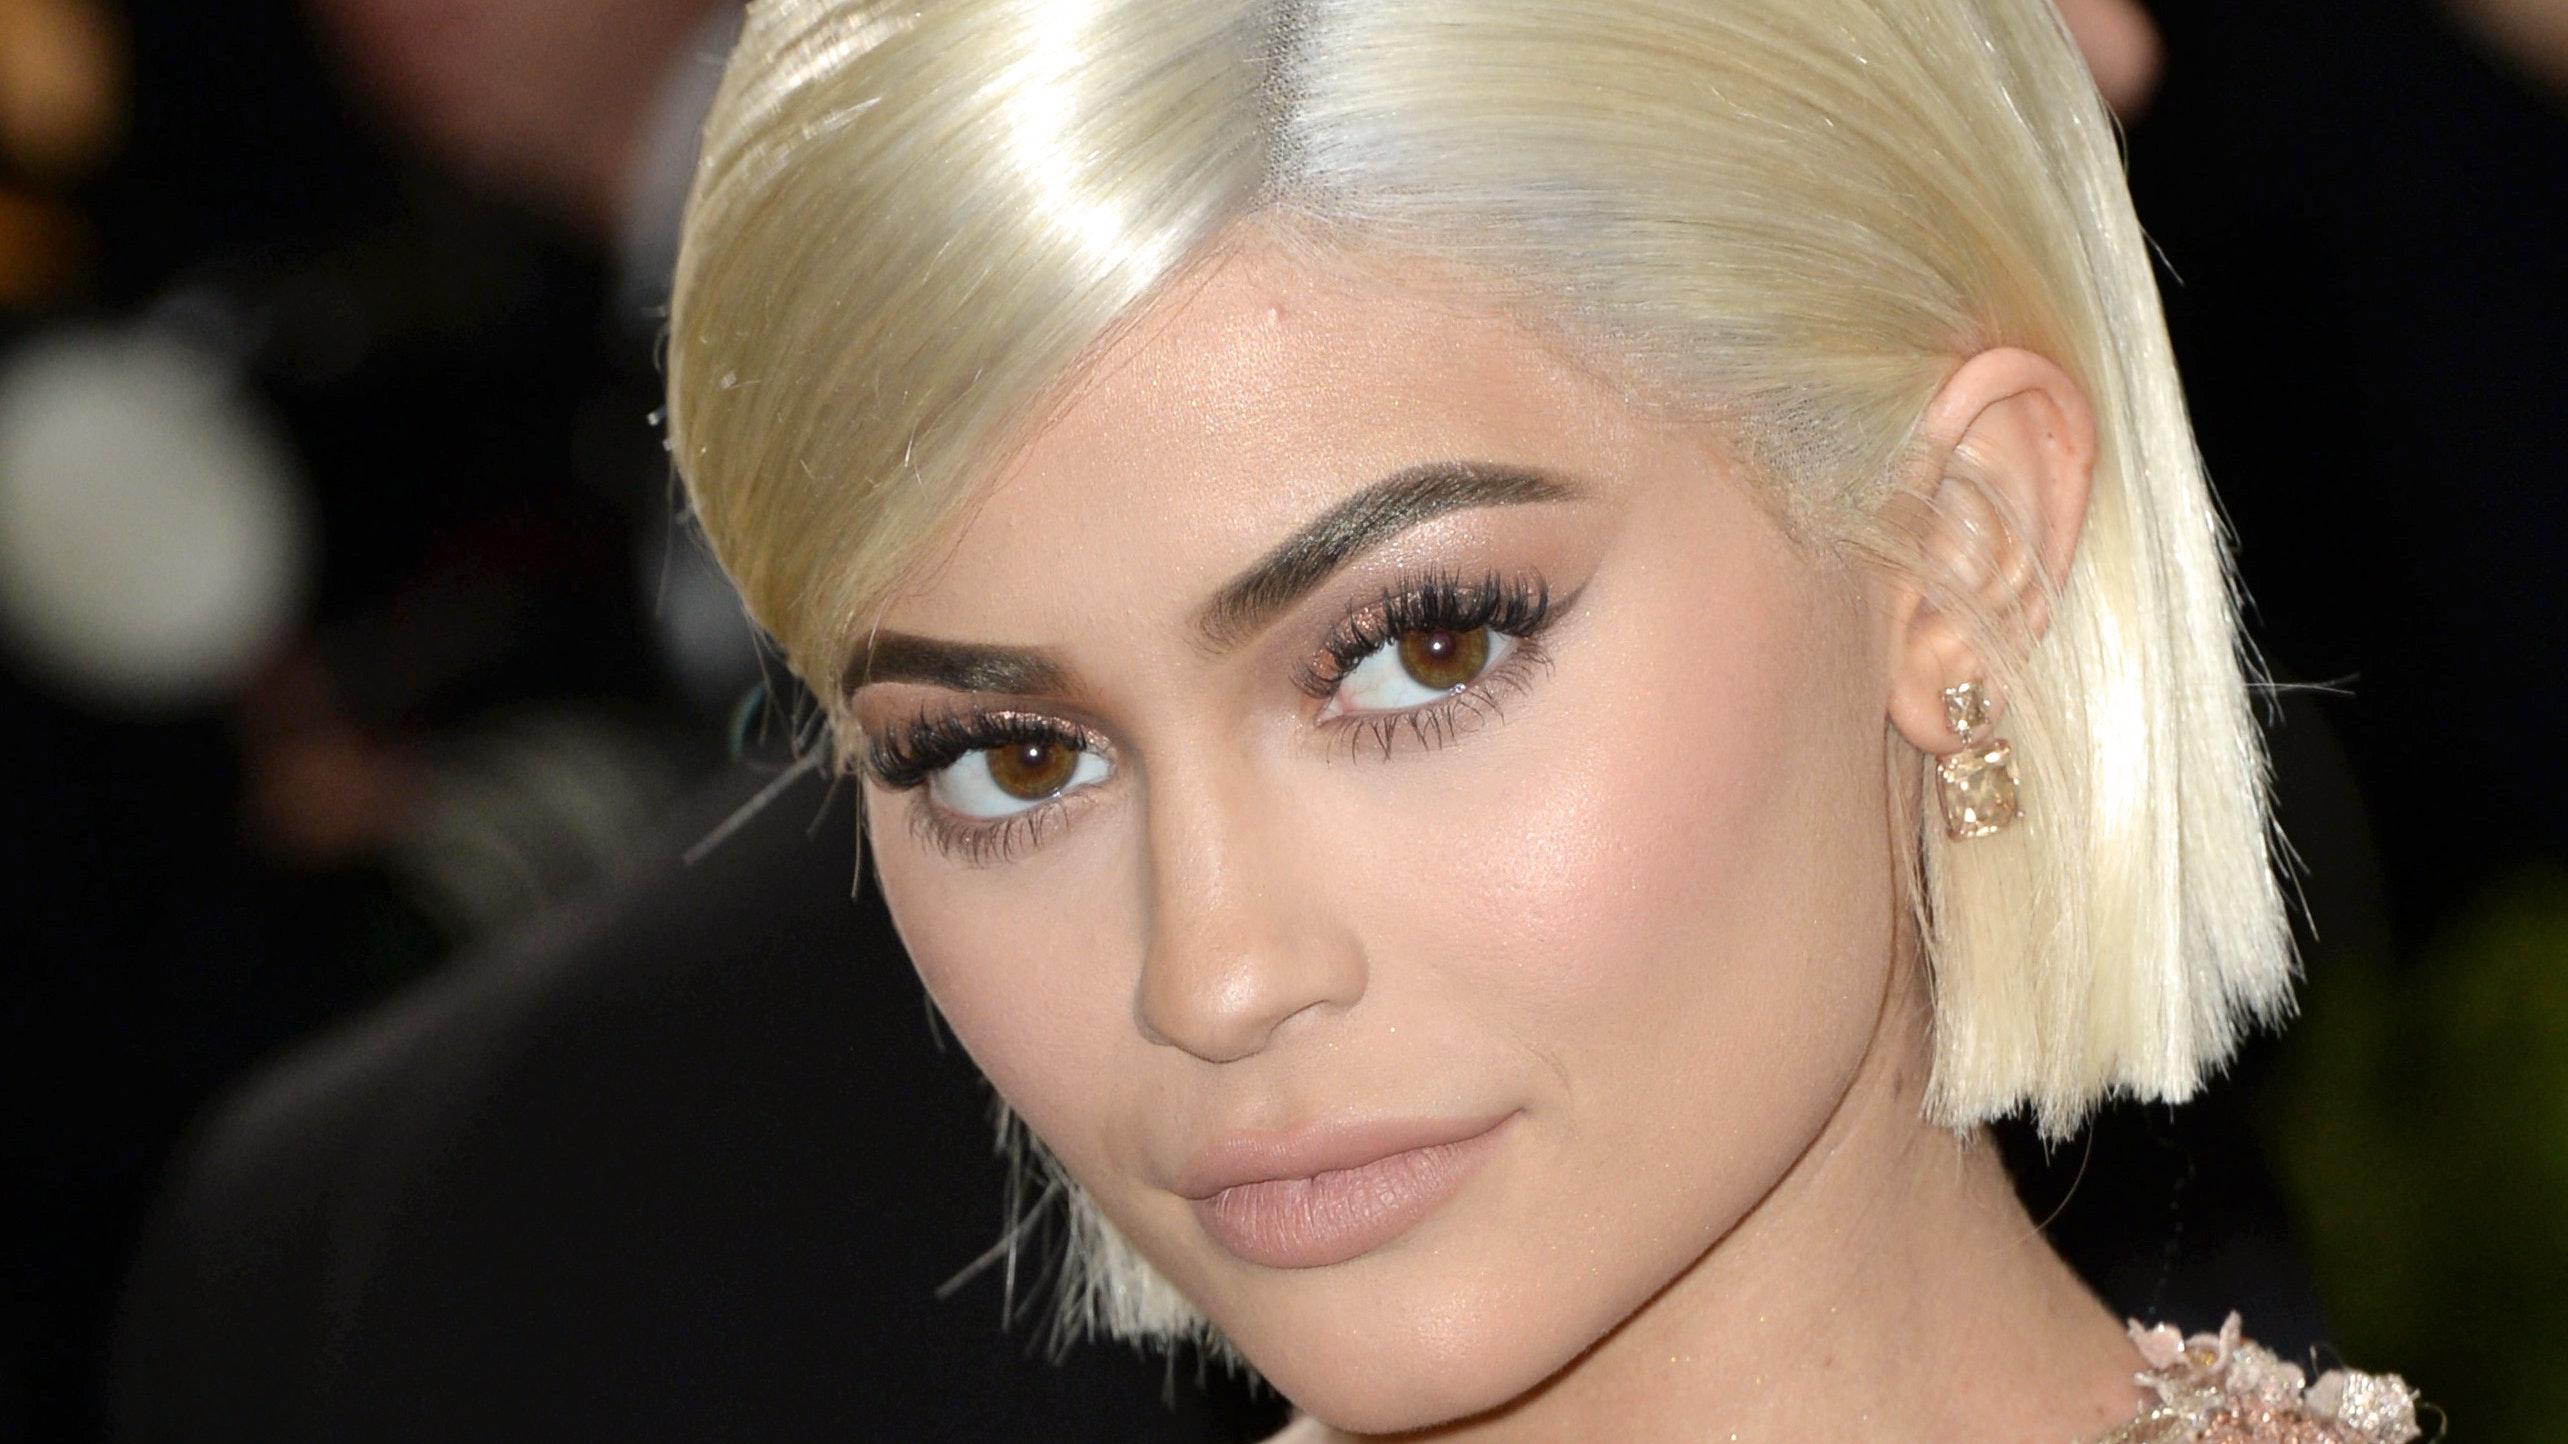 Snap royalty Kylie Jenner helped erase US$1.3 billion